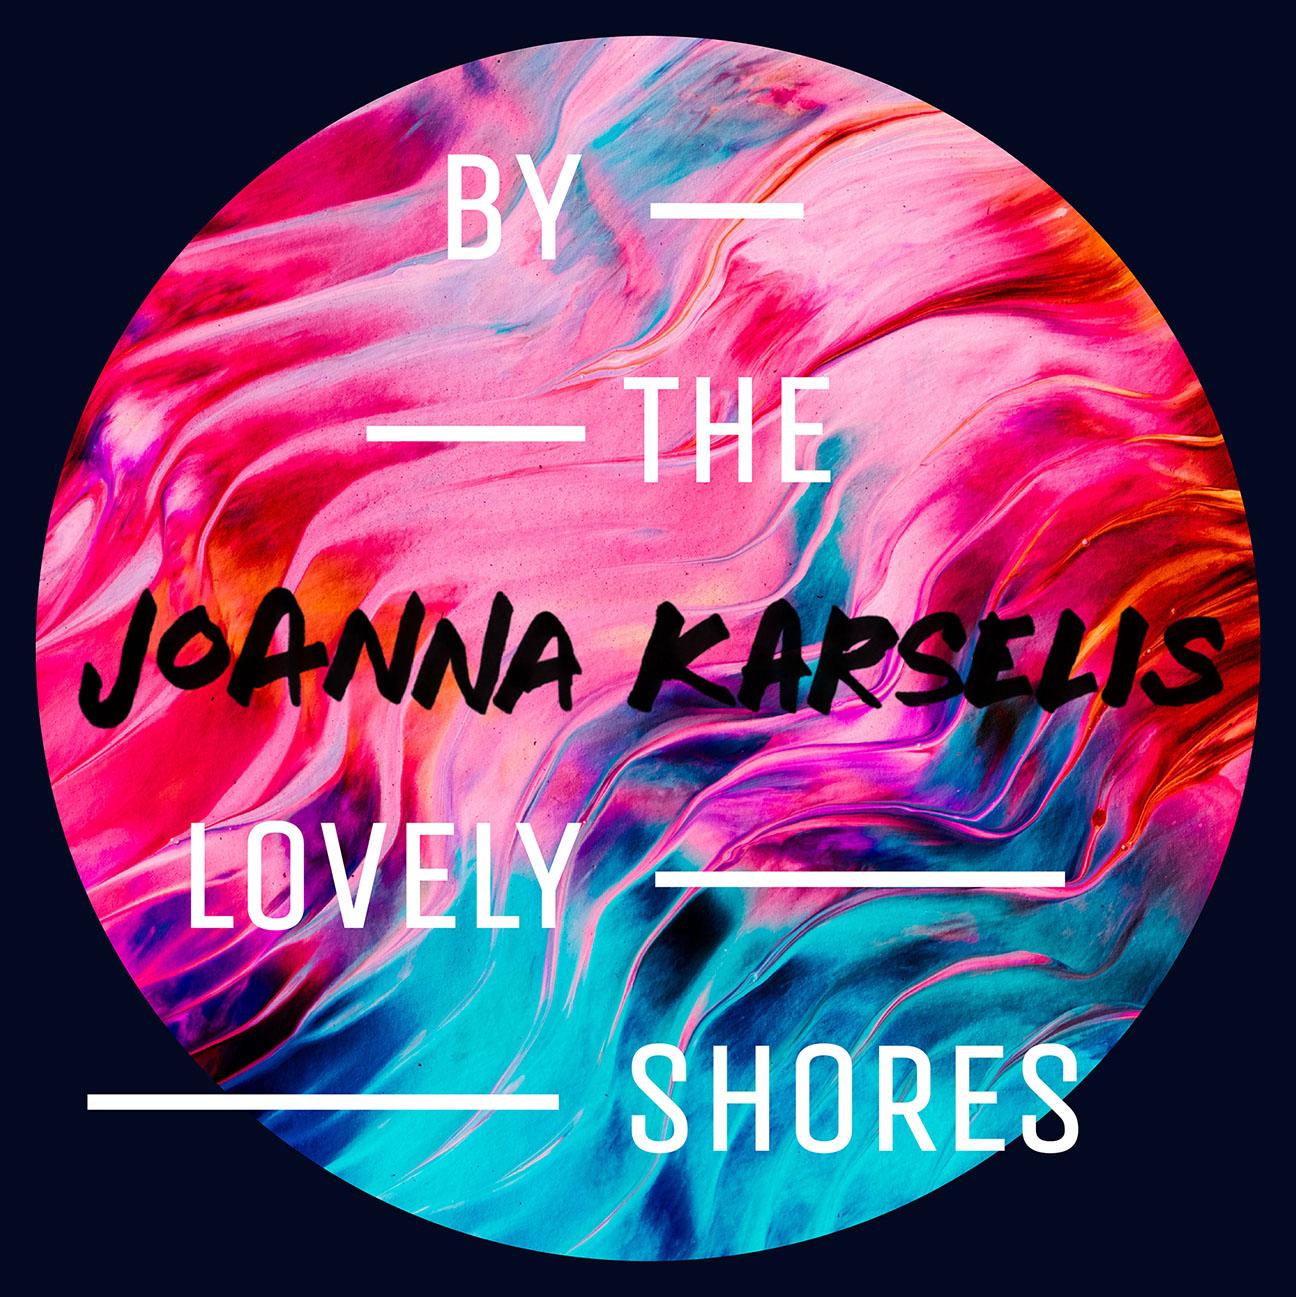 Joanna Karselis By the Lovely Shores Sputnik Faith Art